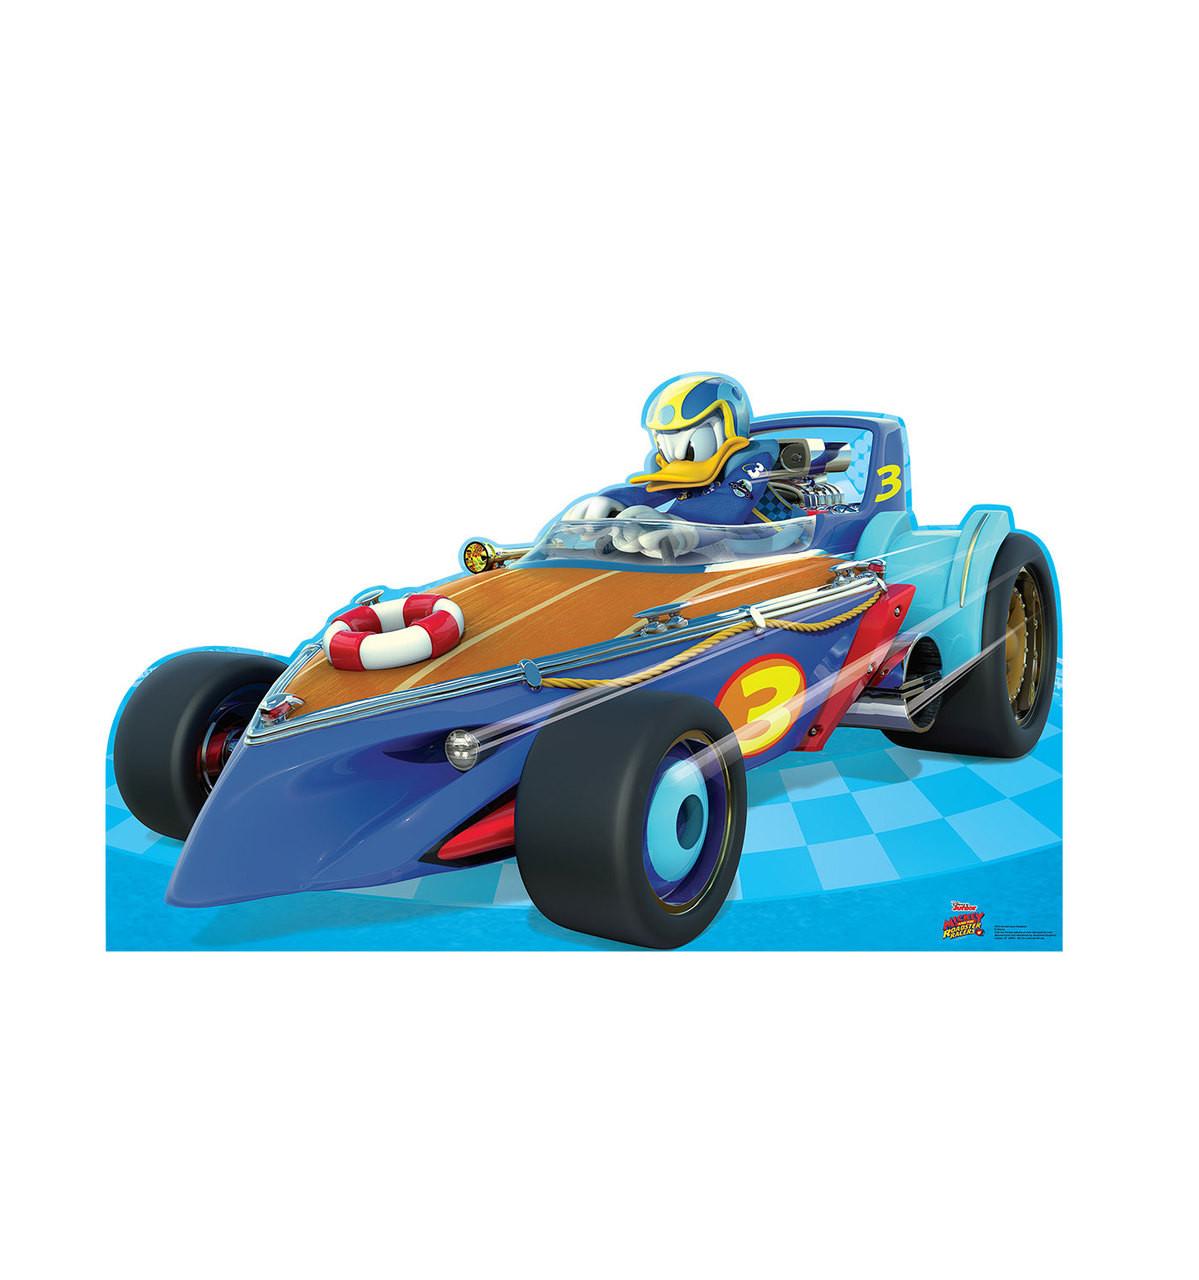 Life-size Donald Duck Roadster (Disney's Roadster Racers) Cardboard Standup 3